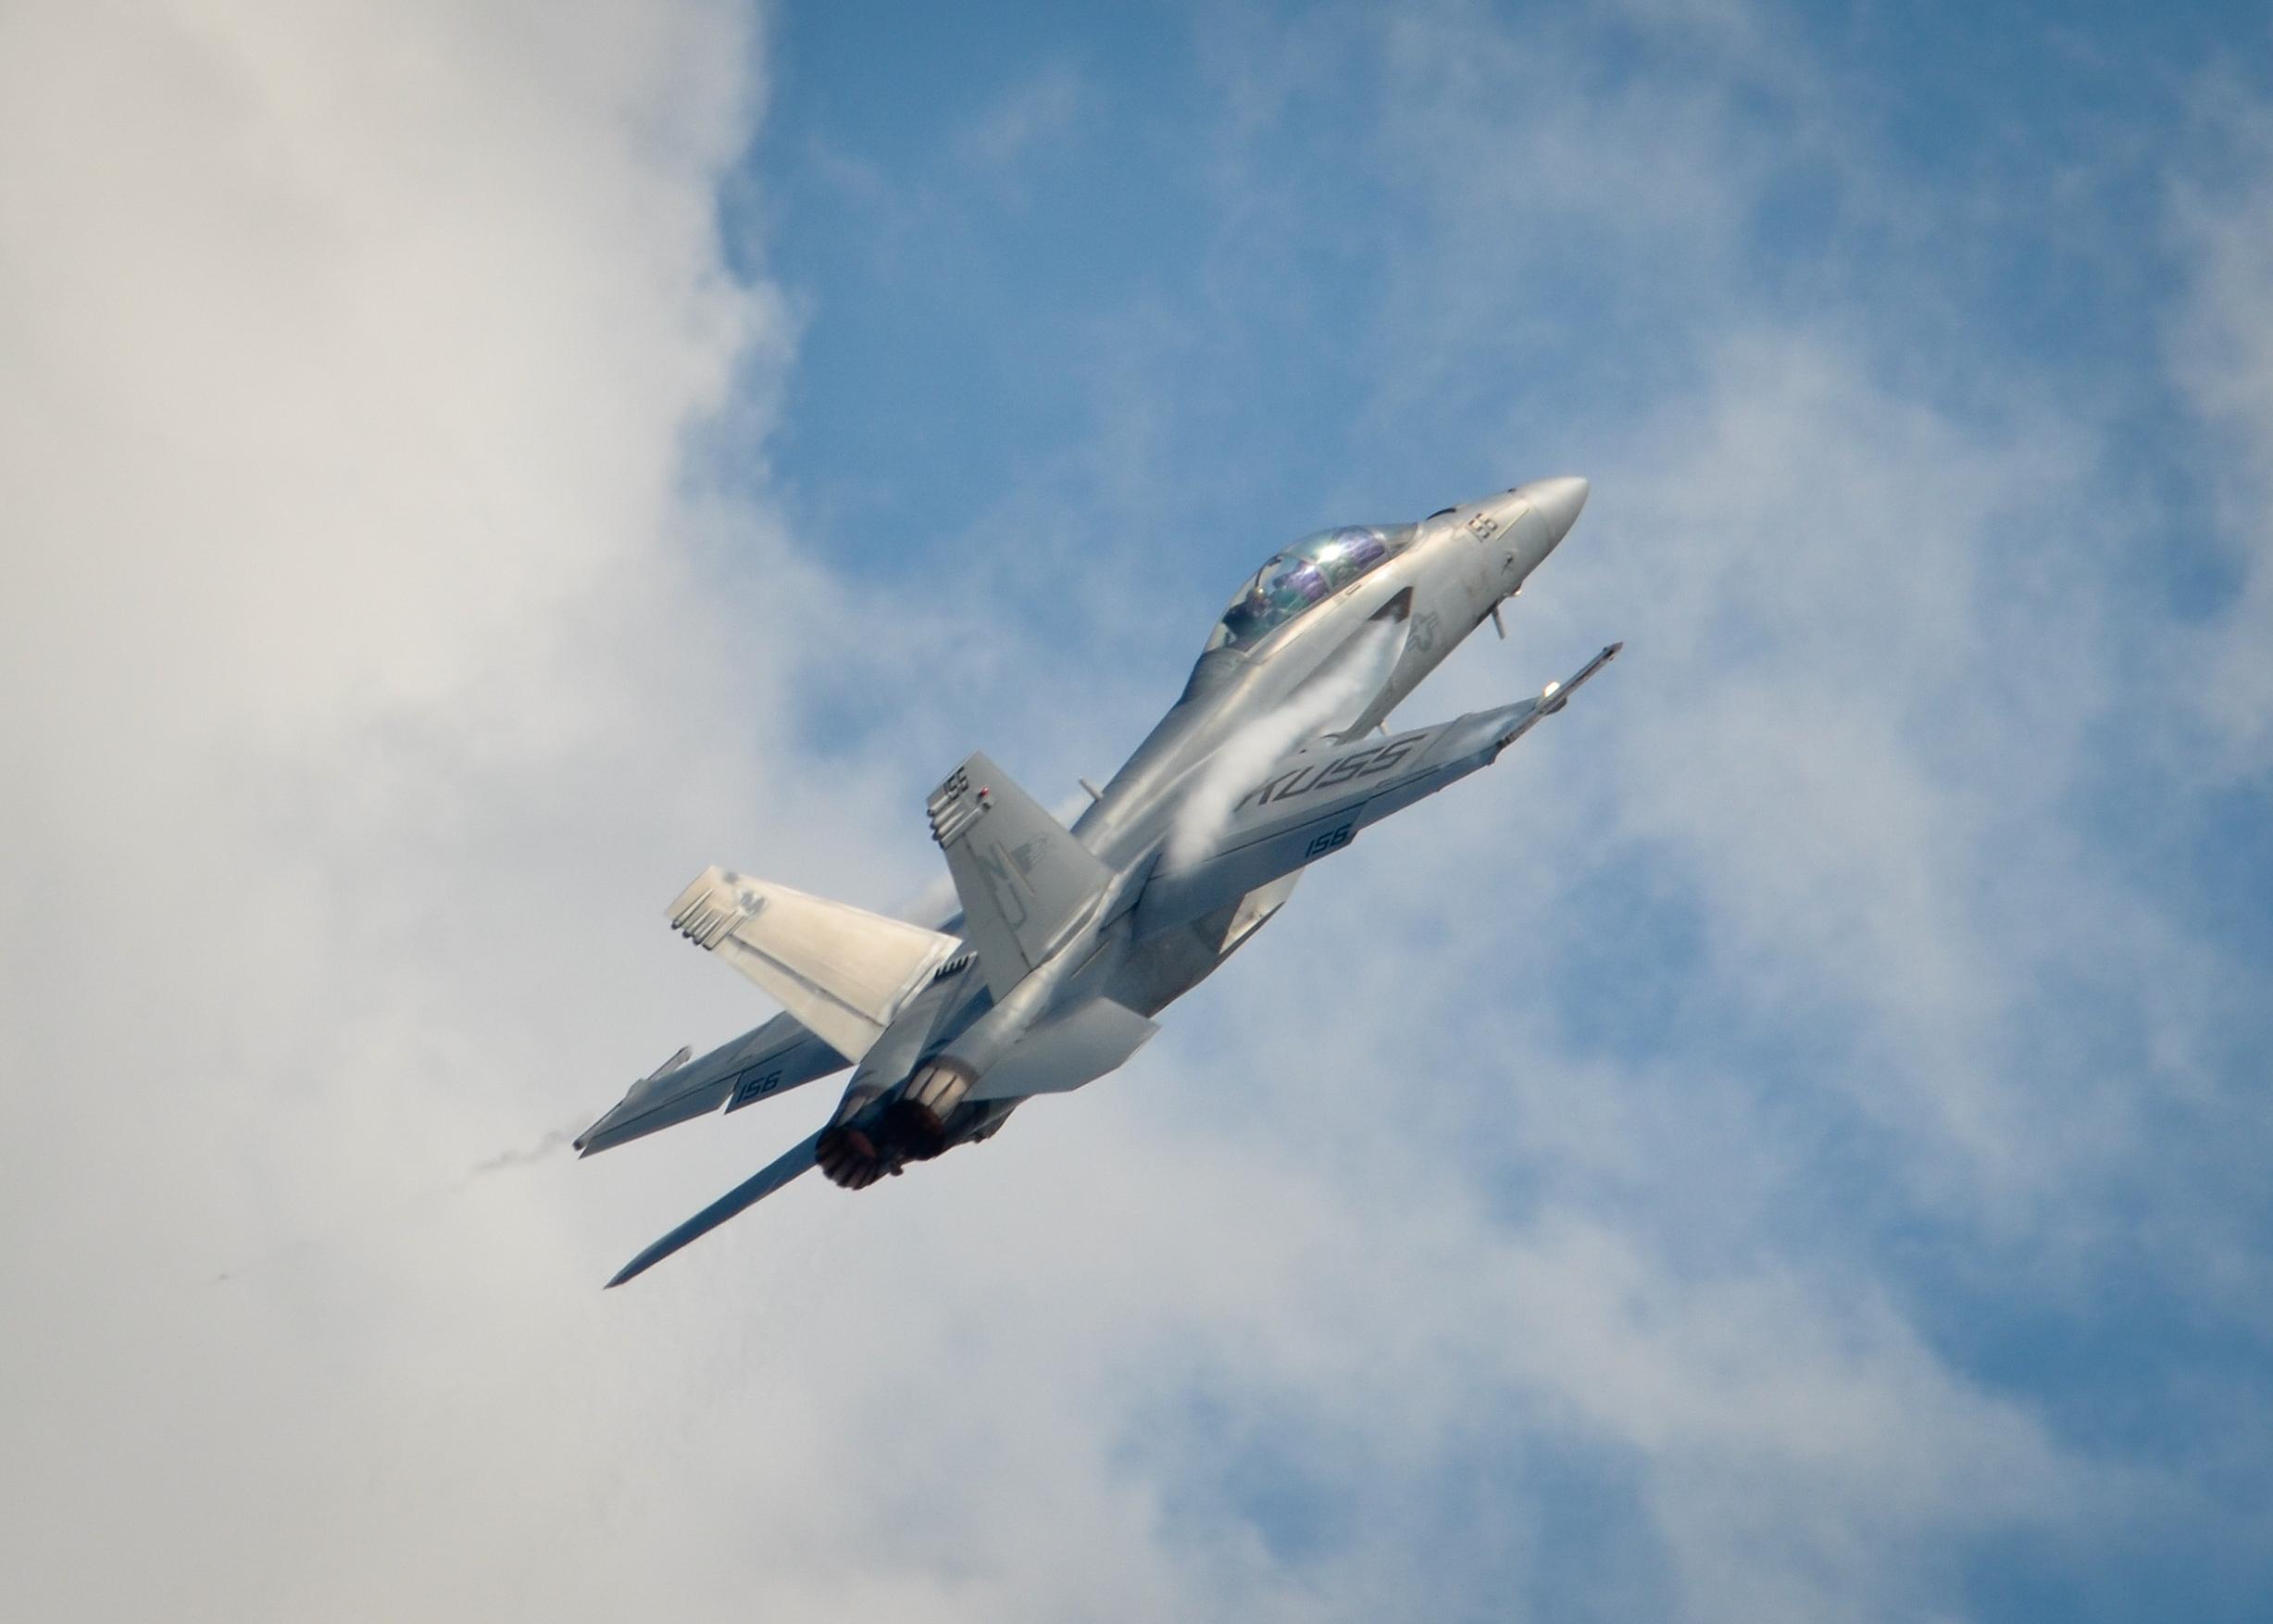 F-18 Hornet High Speed Pull-Up